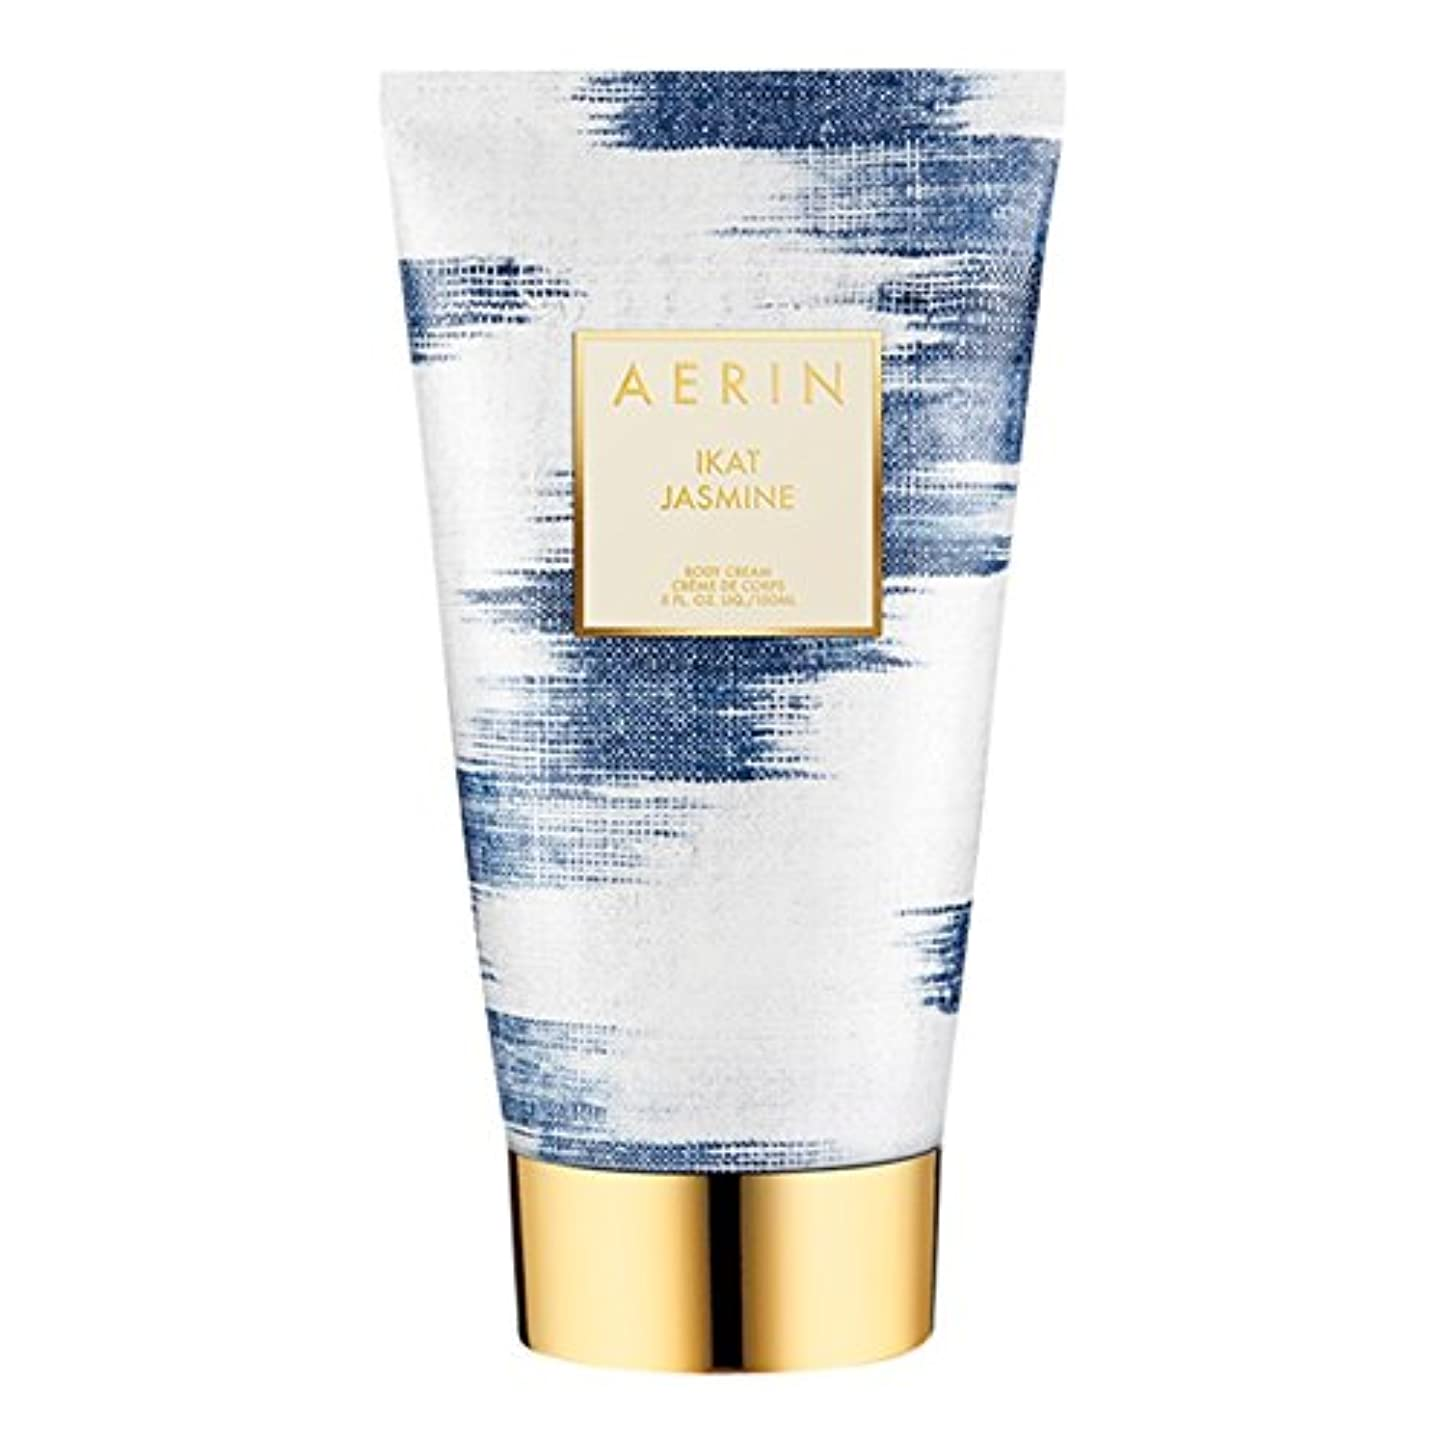 Aerinイカットジャスミンボディクリーム150ミリリットル (AERIN) - AERIN Ikat Jasmine Body Cream 150ml [並行輸入品]